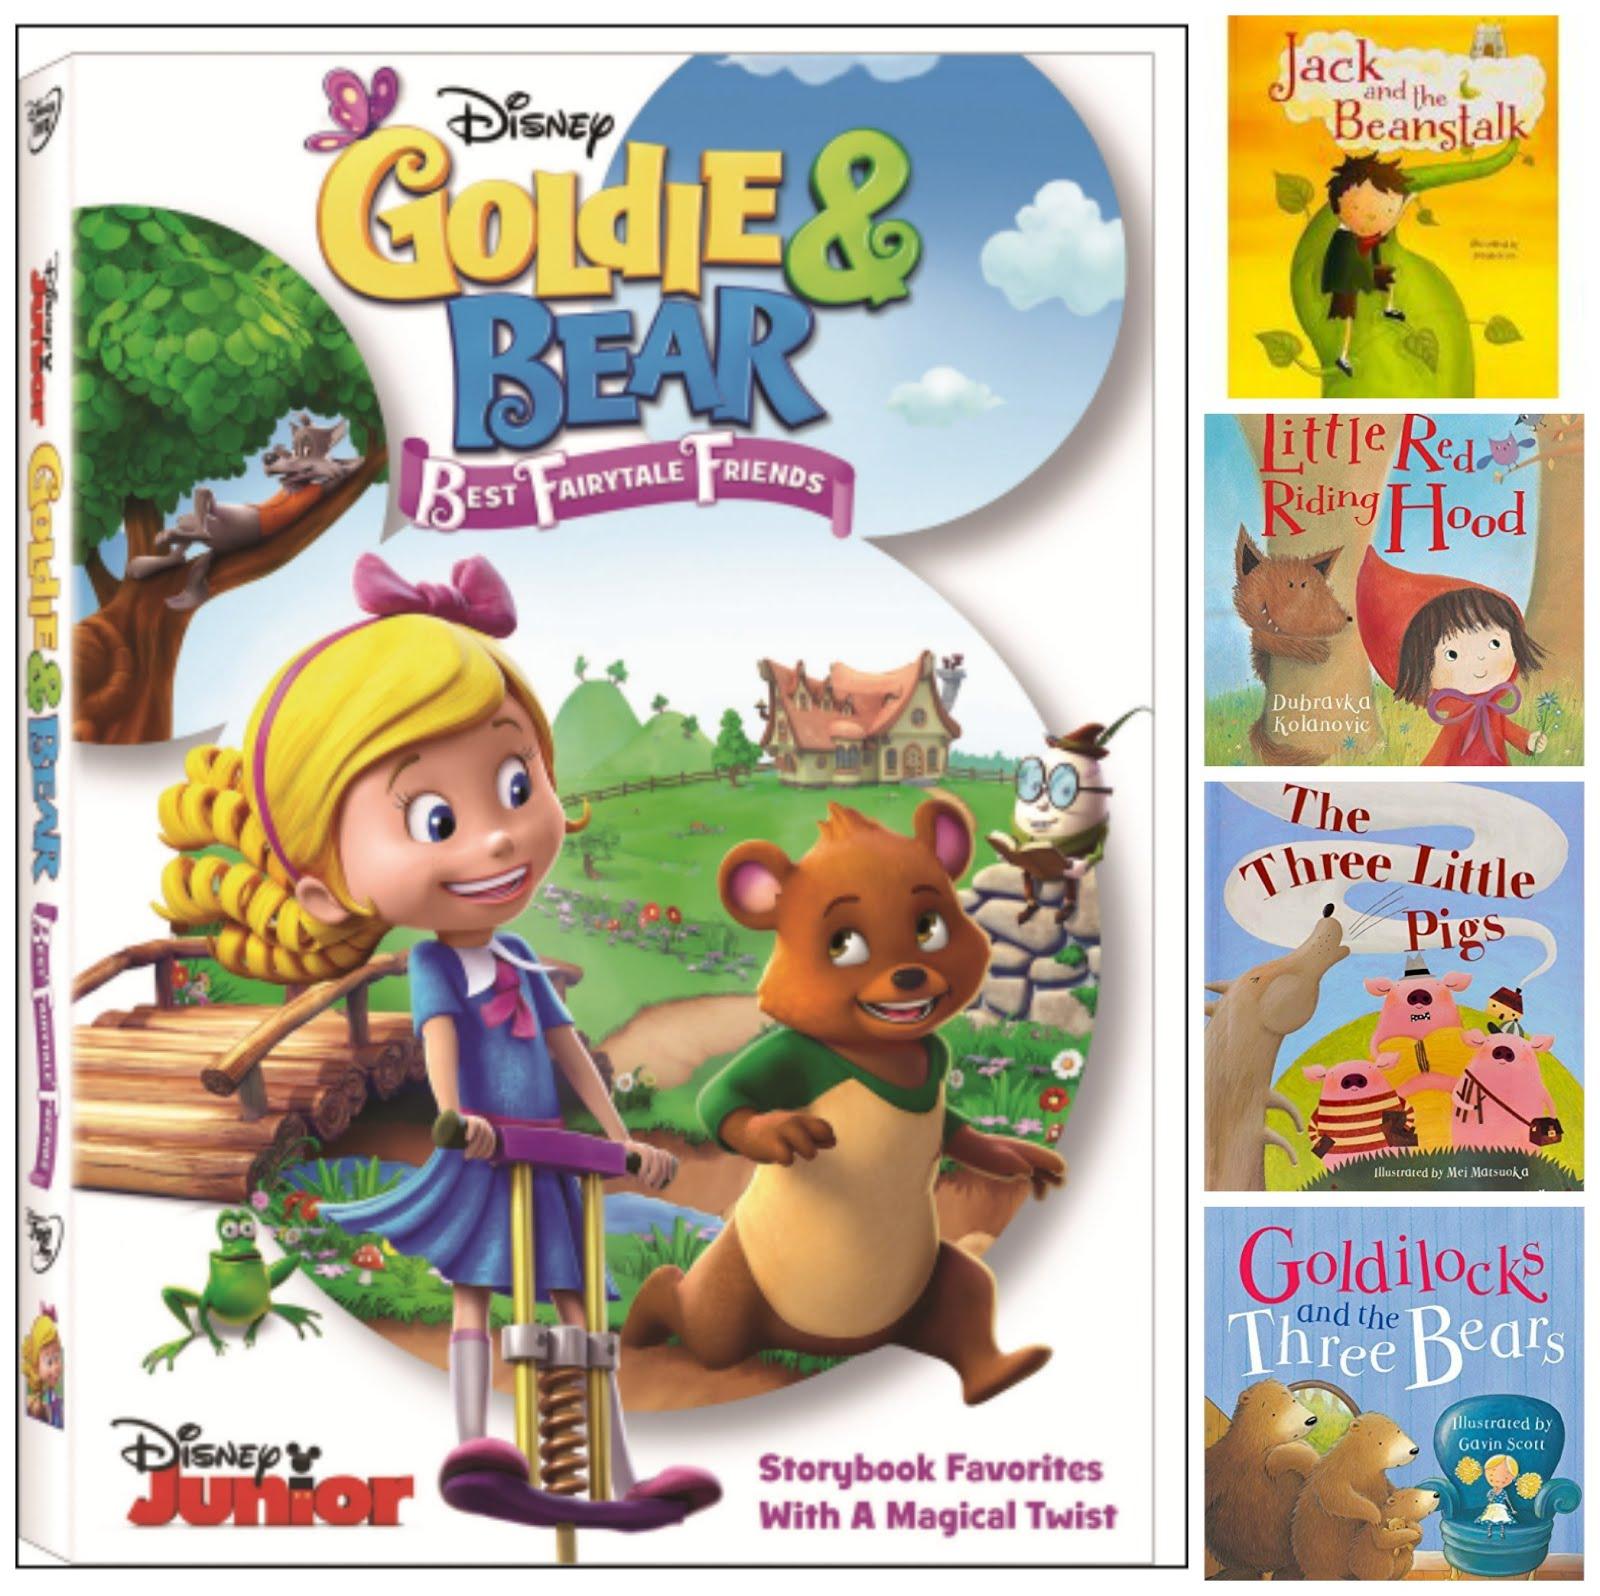 Goldie & Bear DisneyJr DVD